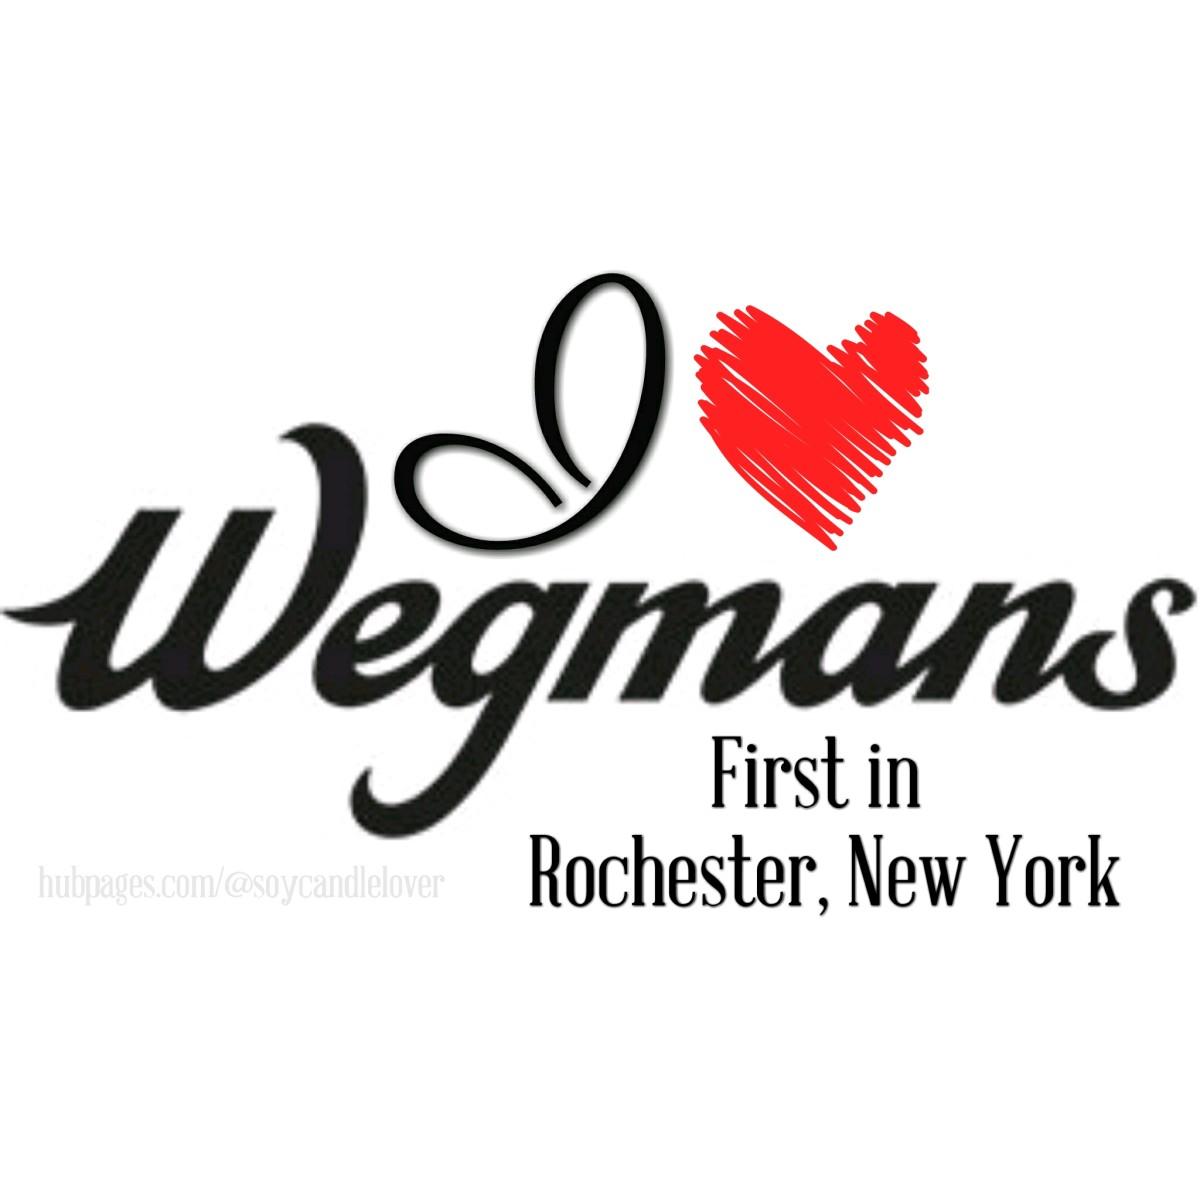 Rochester, New York ~ I ♥ Wegmans